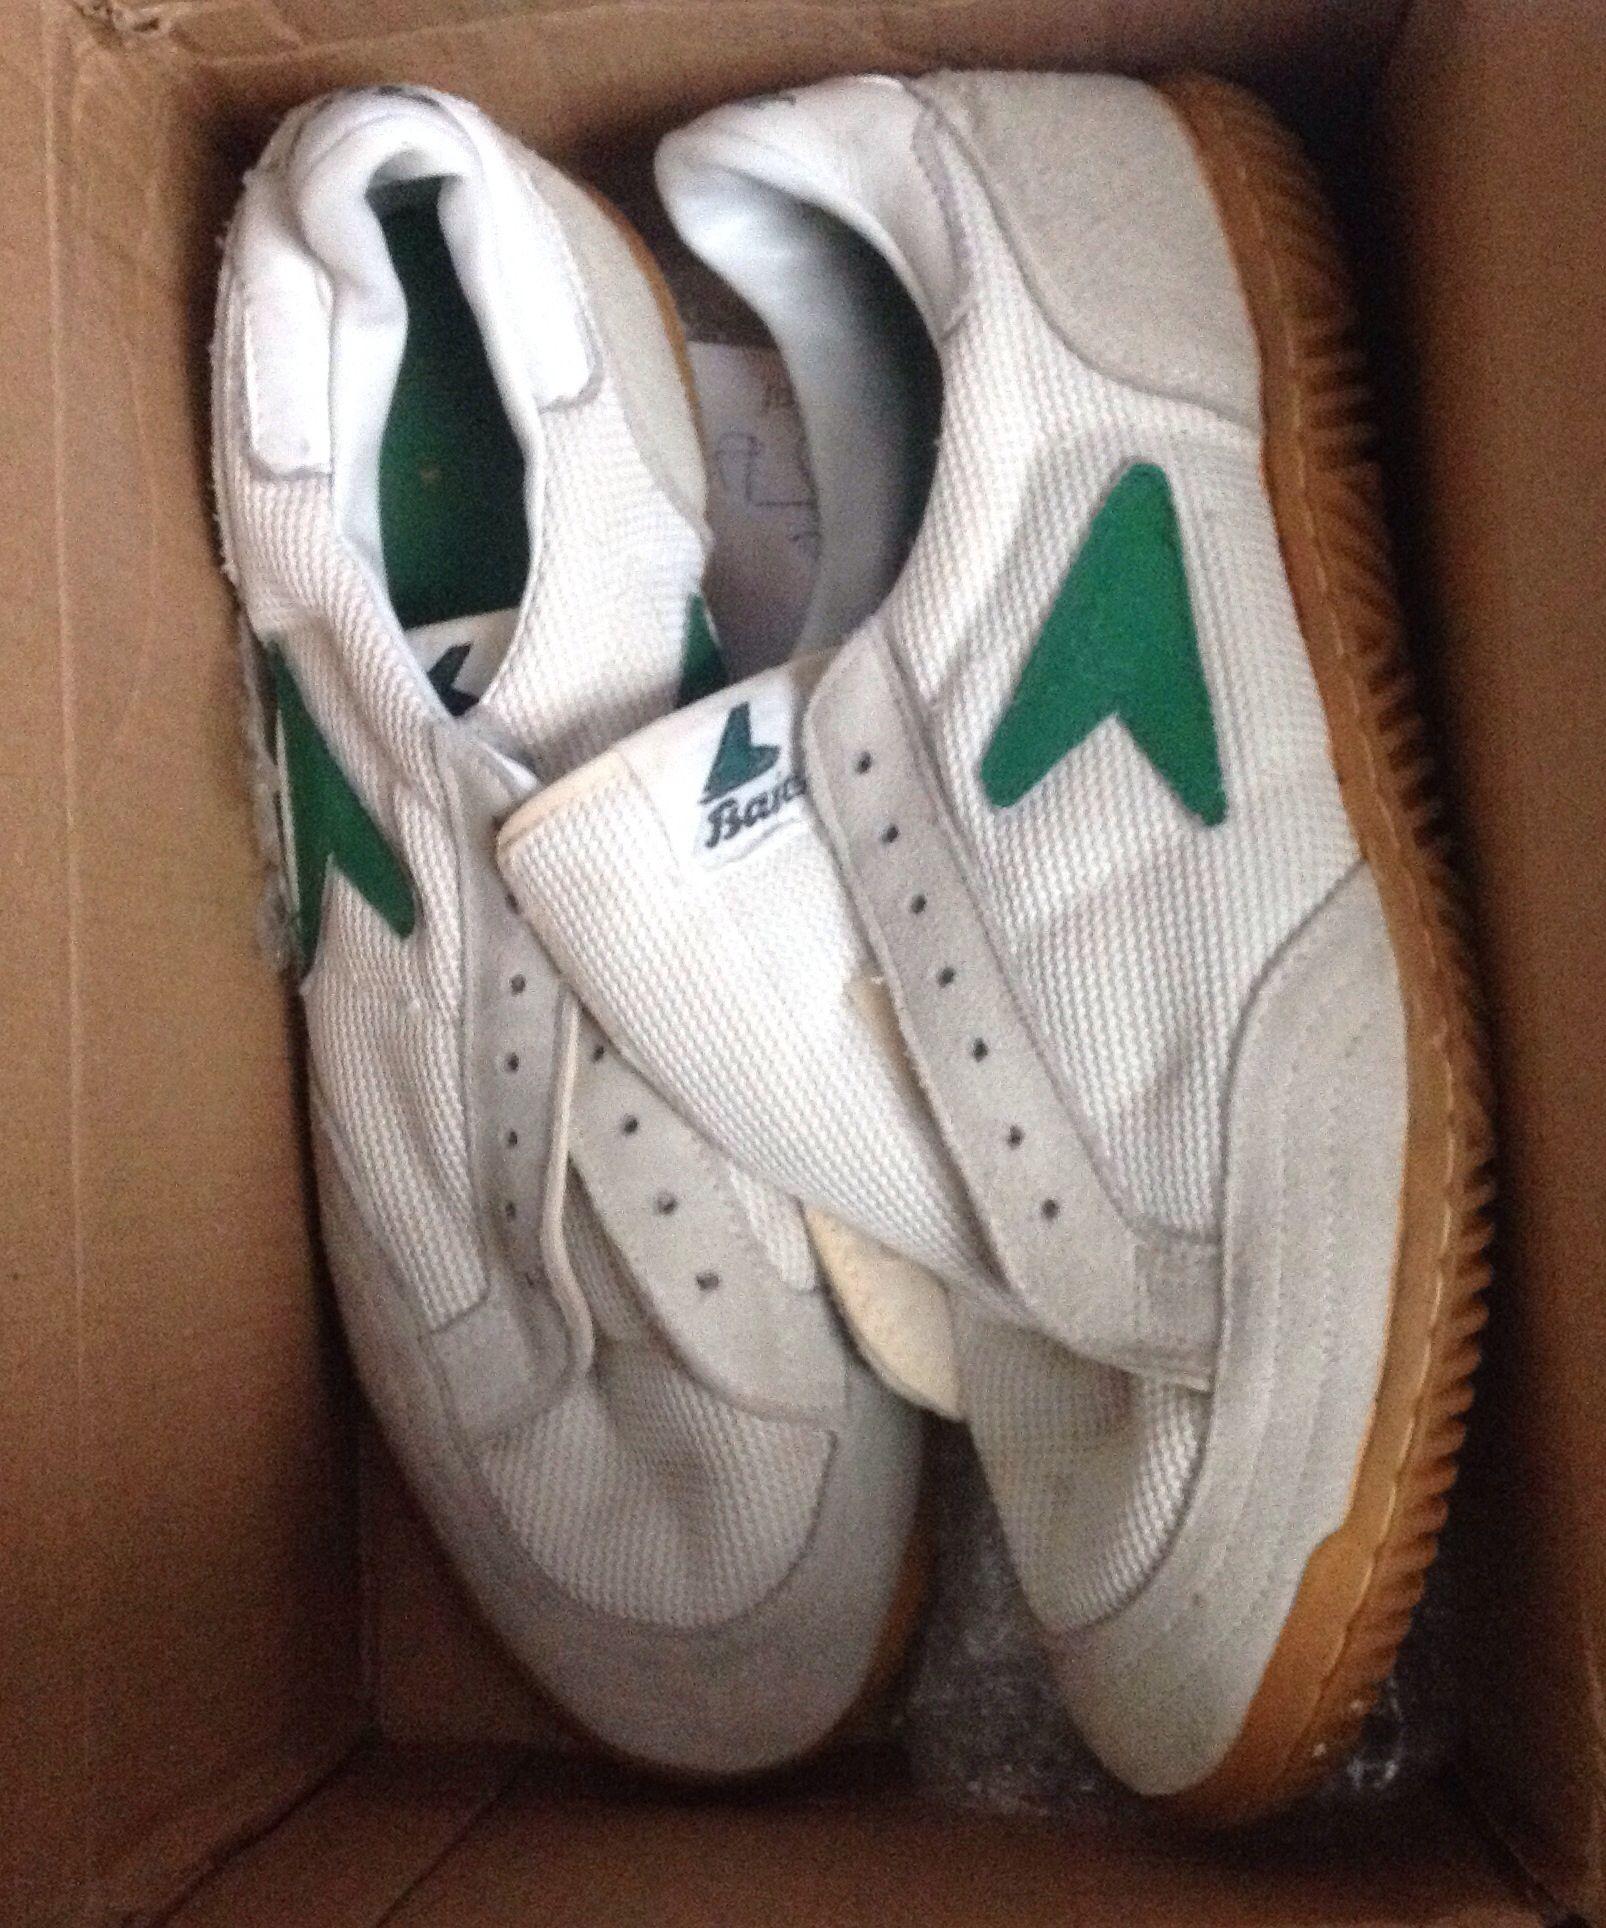 a9ab9f9de Vintage 80 s Bata Squash Sneakers